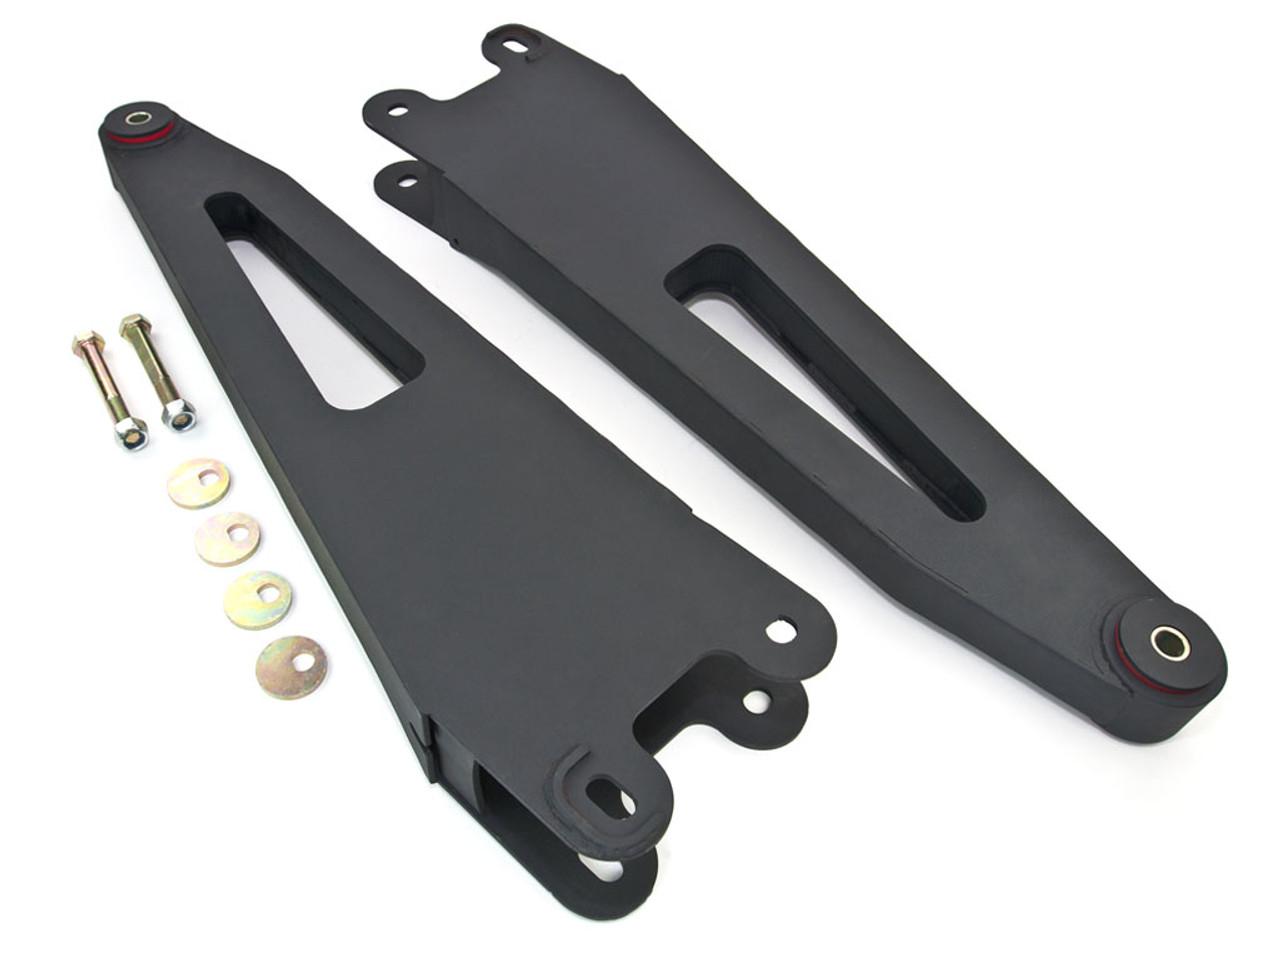 Radius Arm Upgrade For 2 5